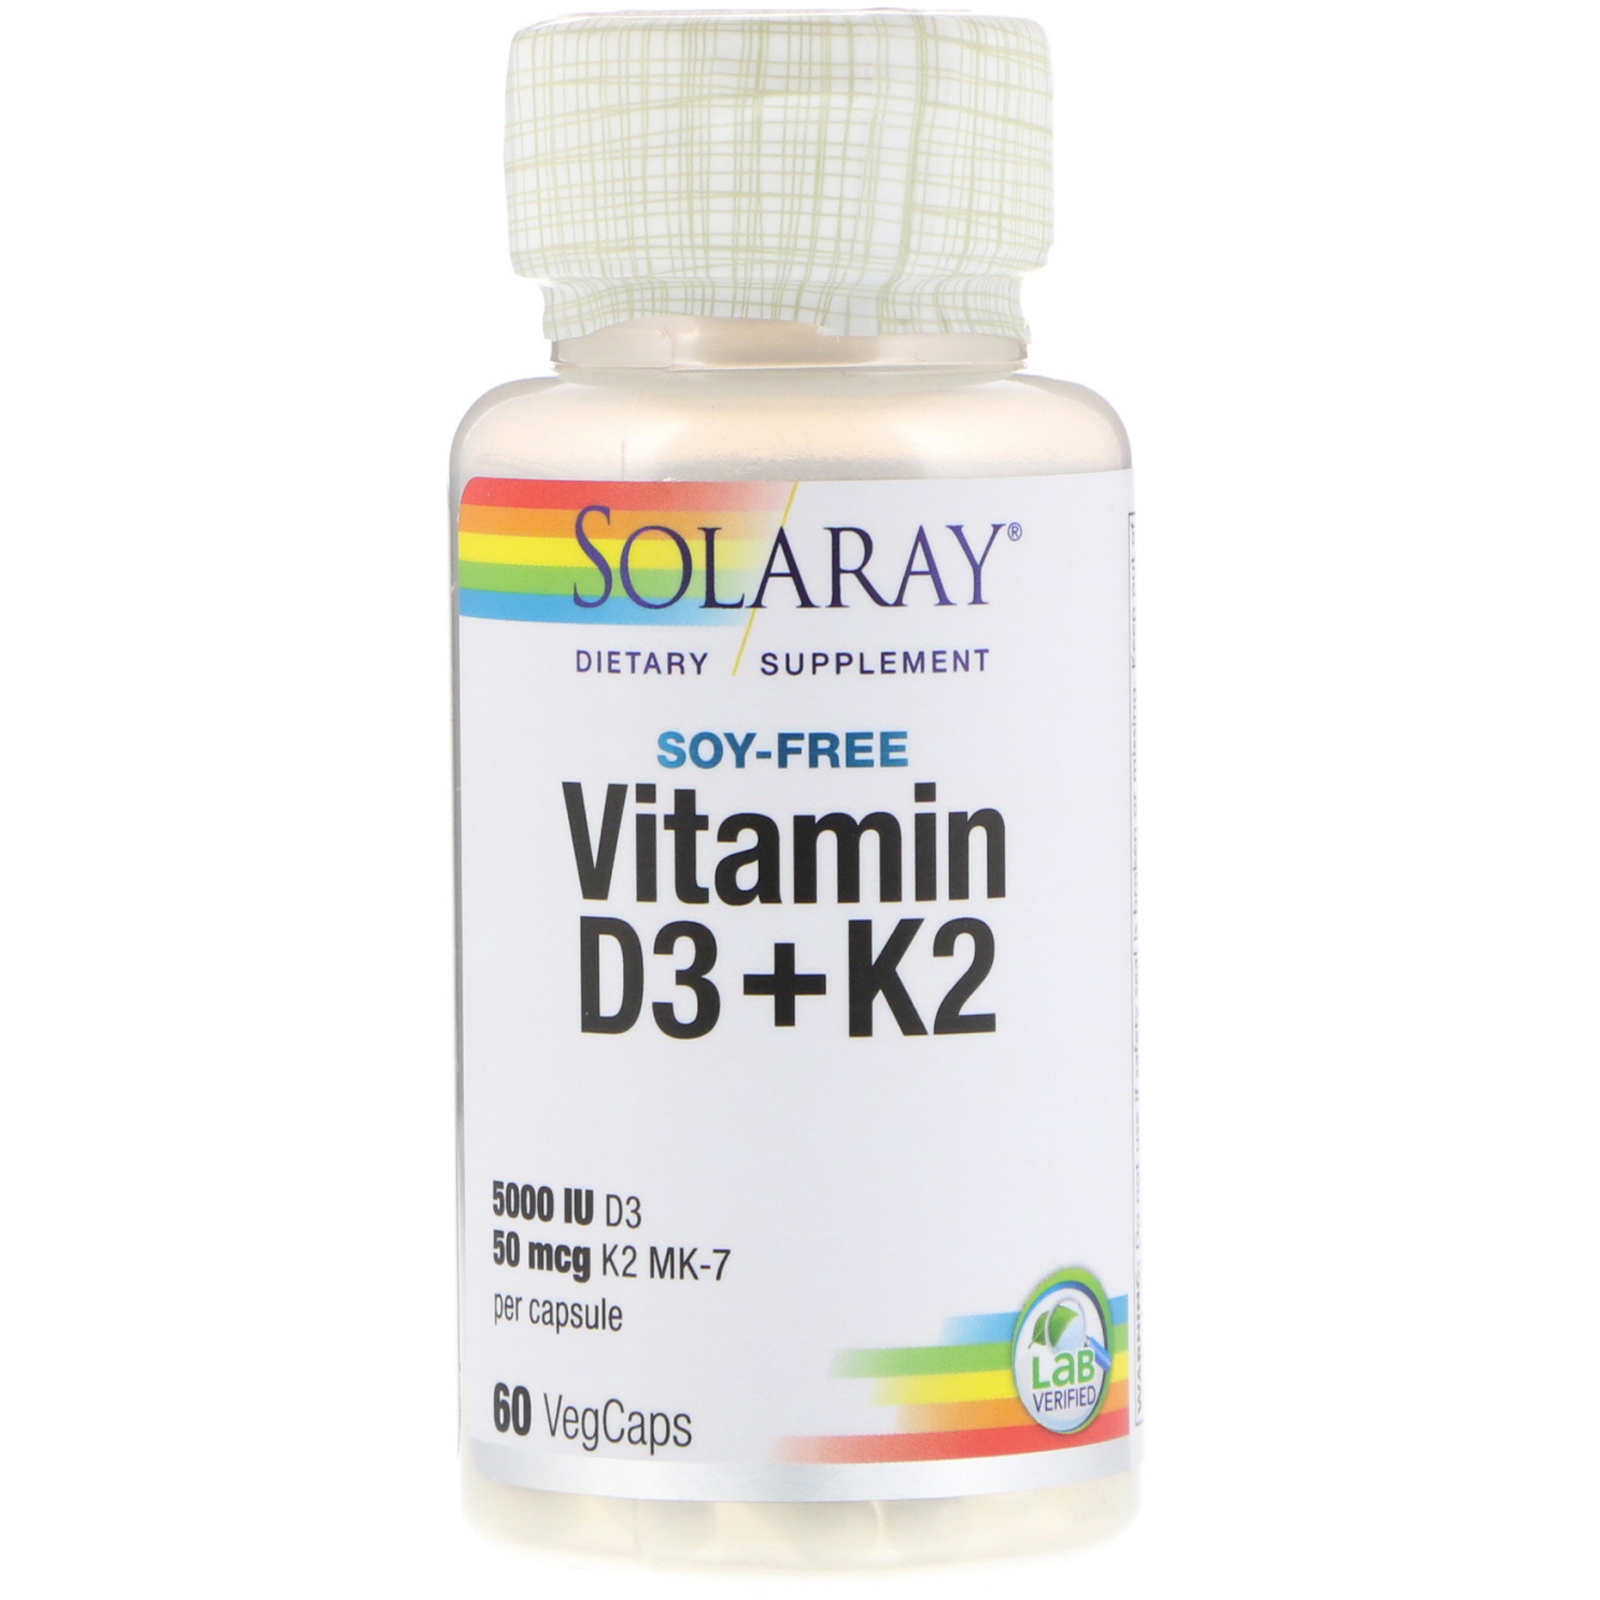 Витамин D3 и K2 Solaray D3 + K2 60 капсул фото